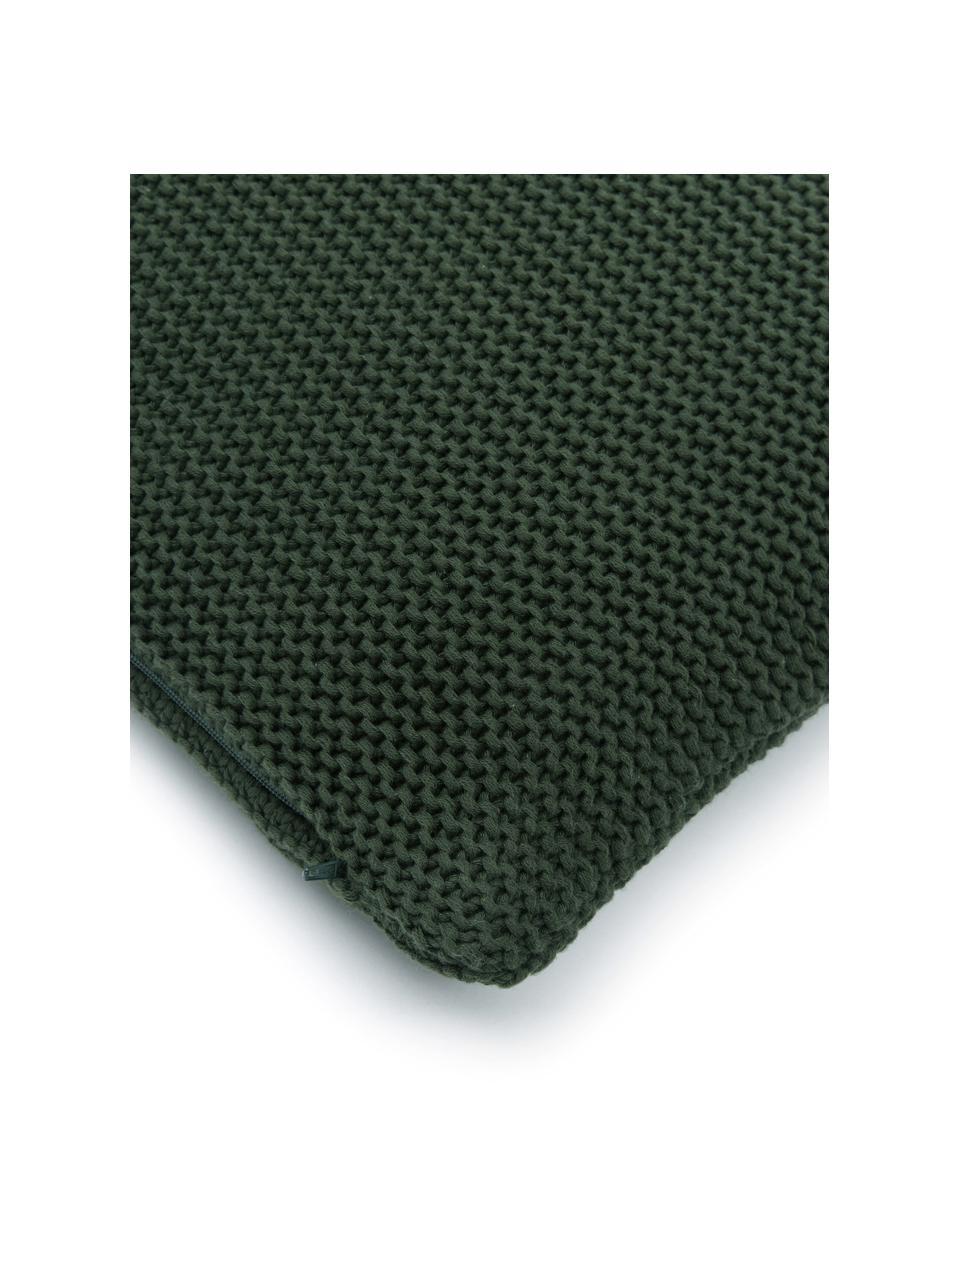 Strick-Kissenhülle Adalyn aus Bio-Baumwolle in Dunkelgrün, 100% Bio-Baumwolle, GOTS-zertifiziert, Dunkelgrün, 50 x 50 cm